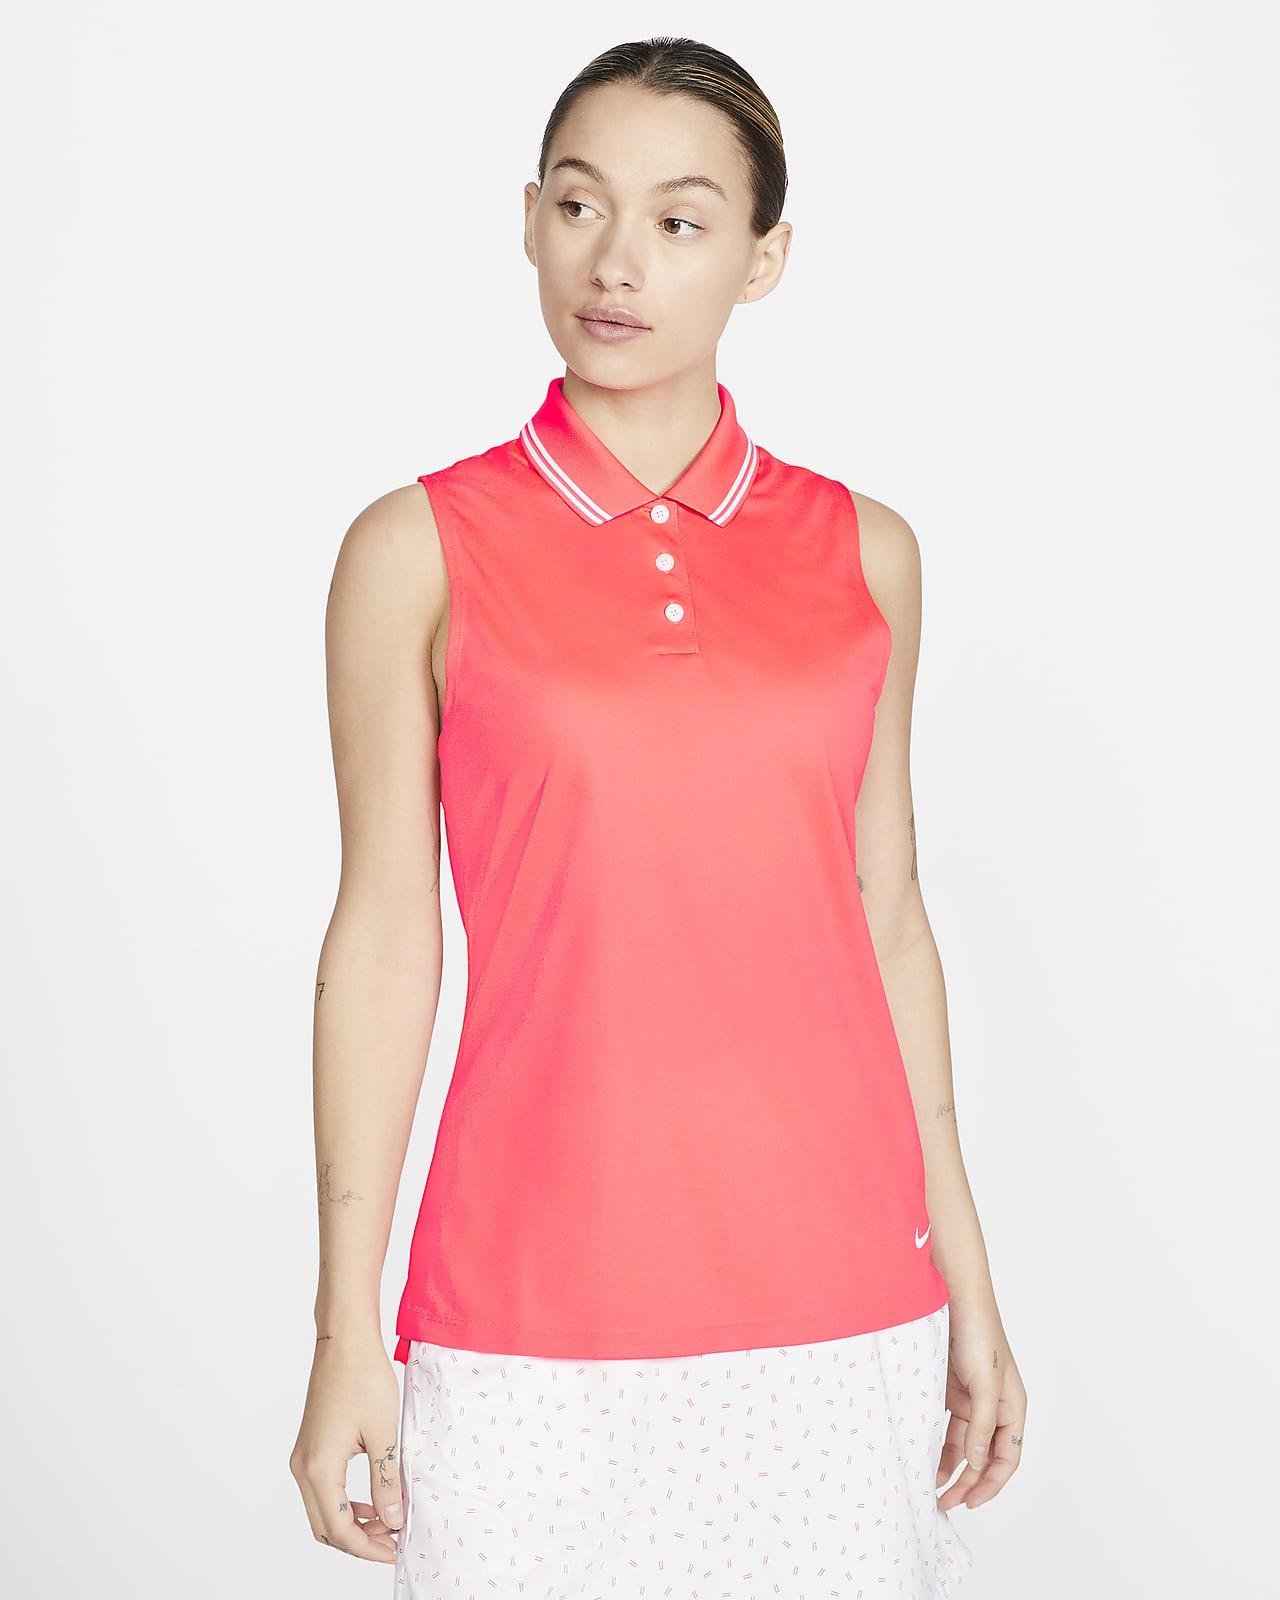 Nike Dri-FIT Victory Women's Sleeveless Golf Polo